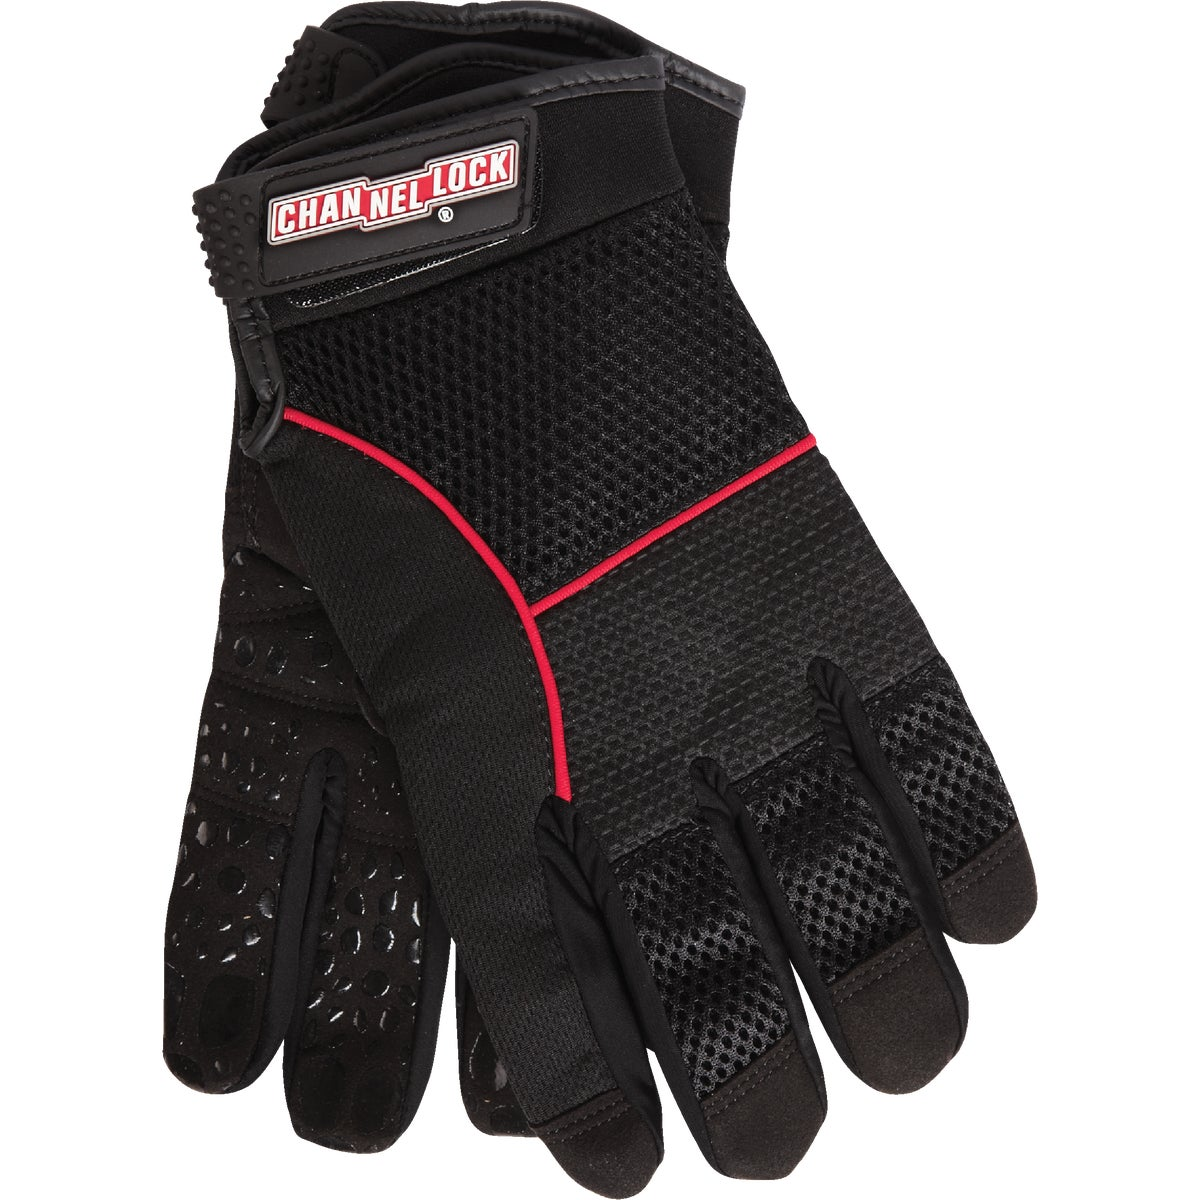 Channellock Utility Grip High Performance Glove, ULTRA GRIP-XXL